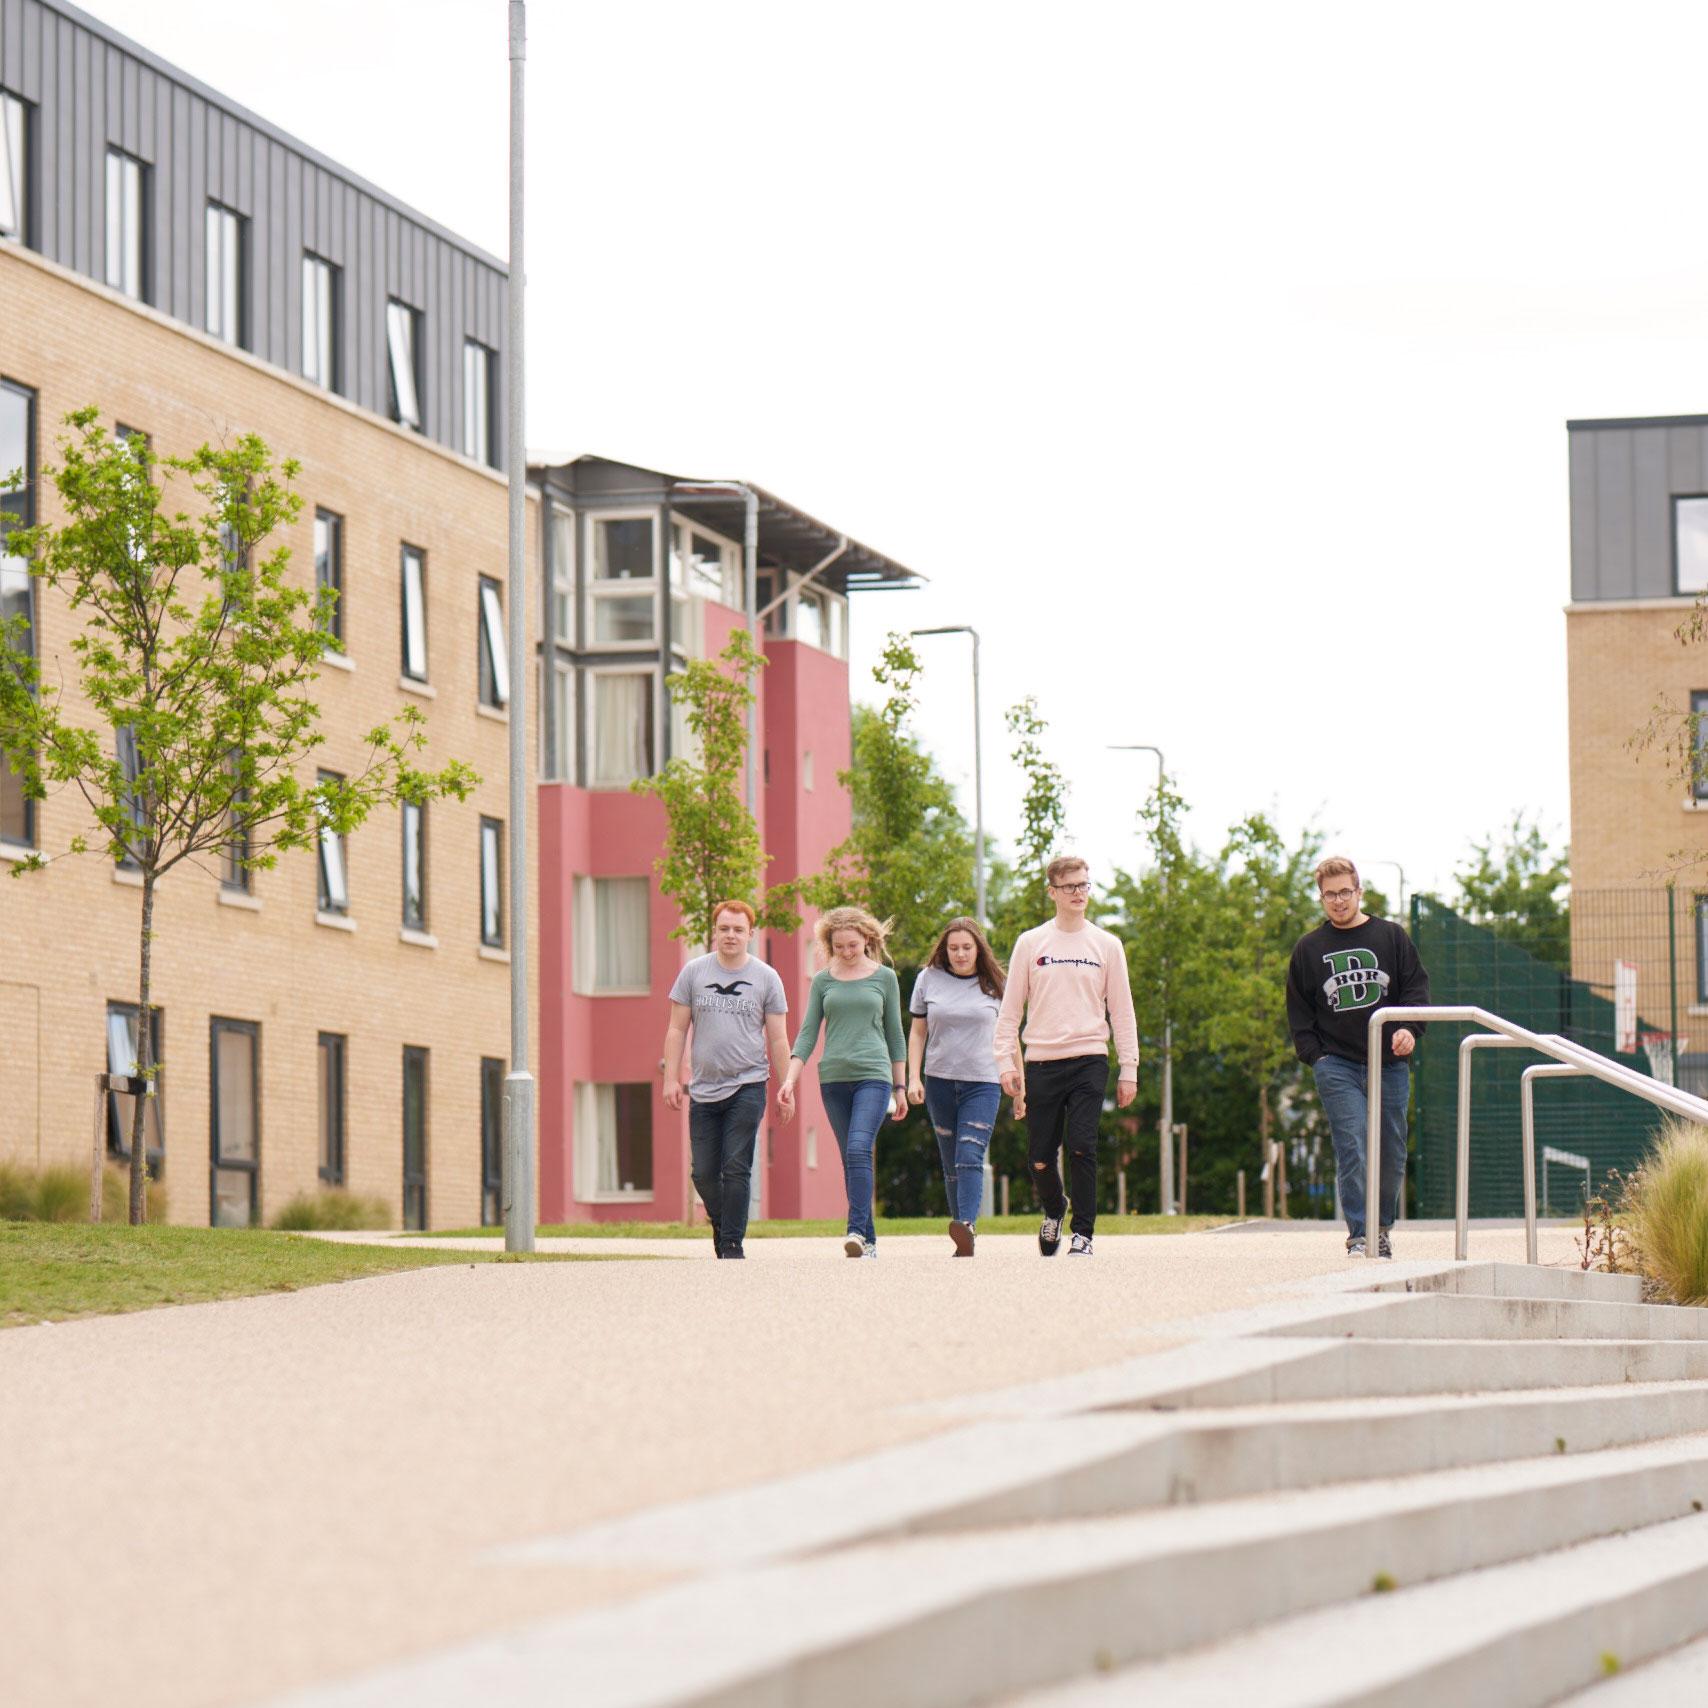 Students walking outside at Pittville Student Village, Cheltenham.